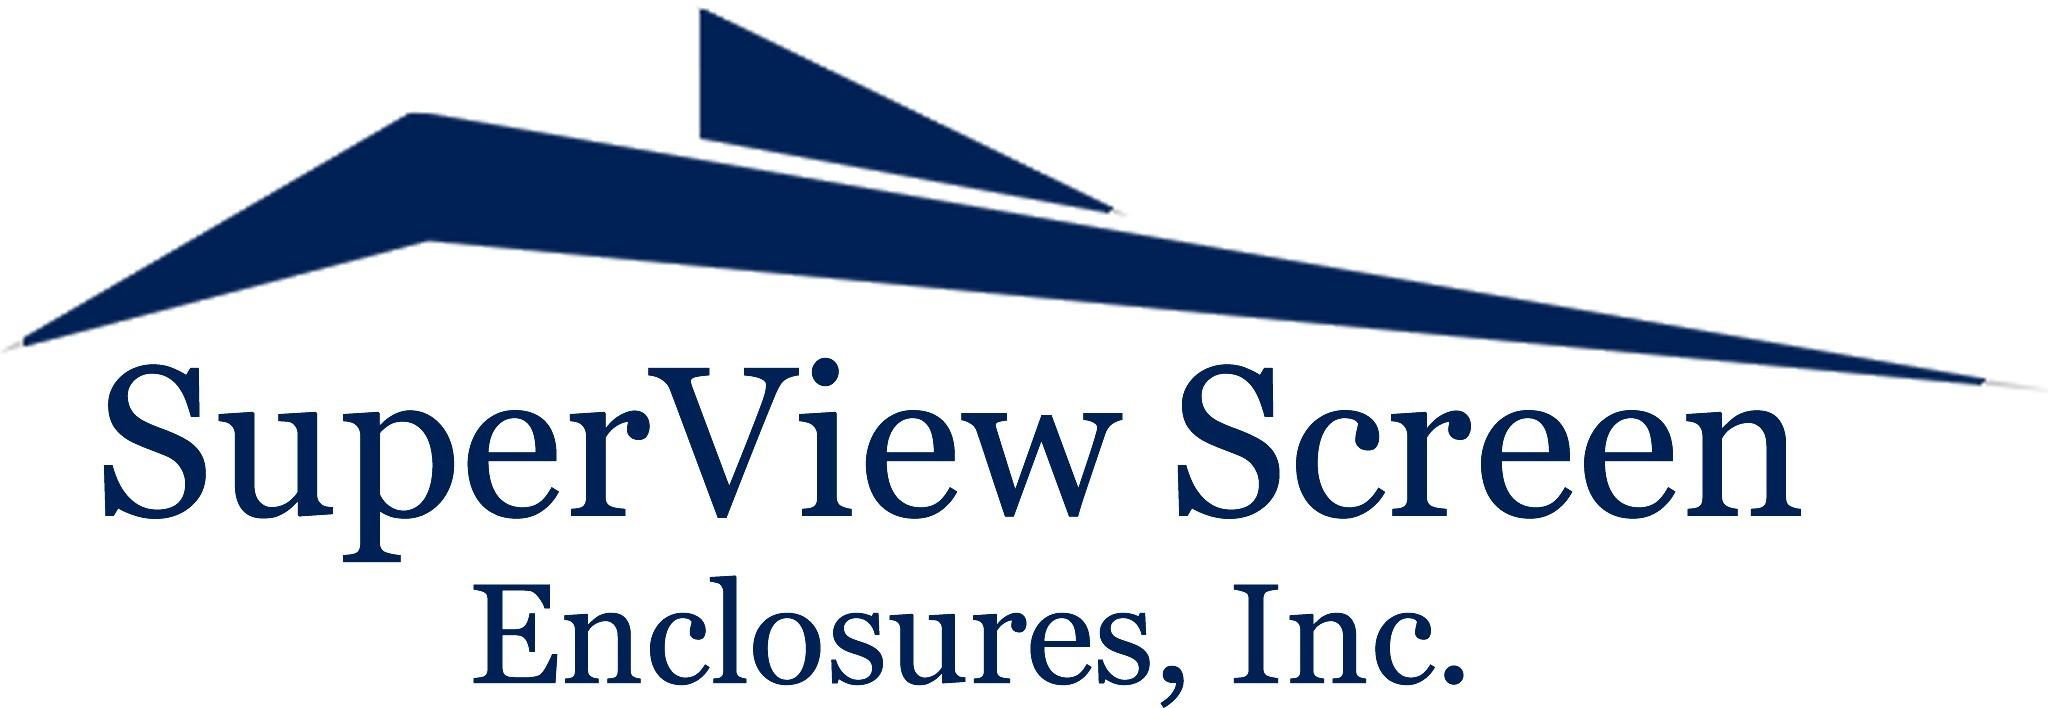 Superview ScreenEnclosures (@superviewscreens) Cover Image